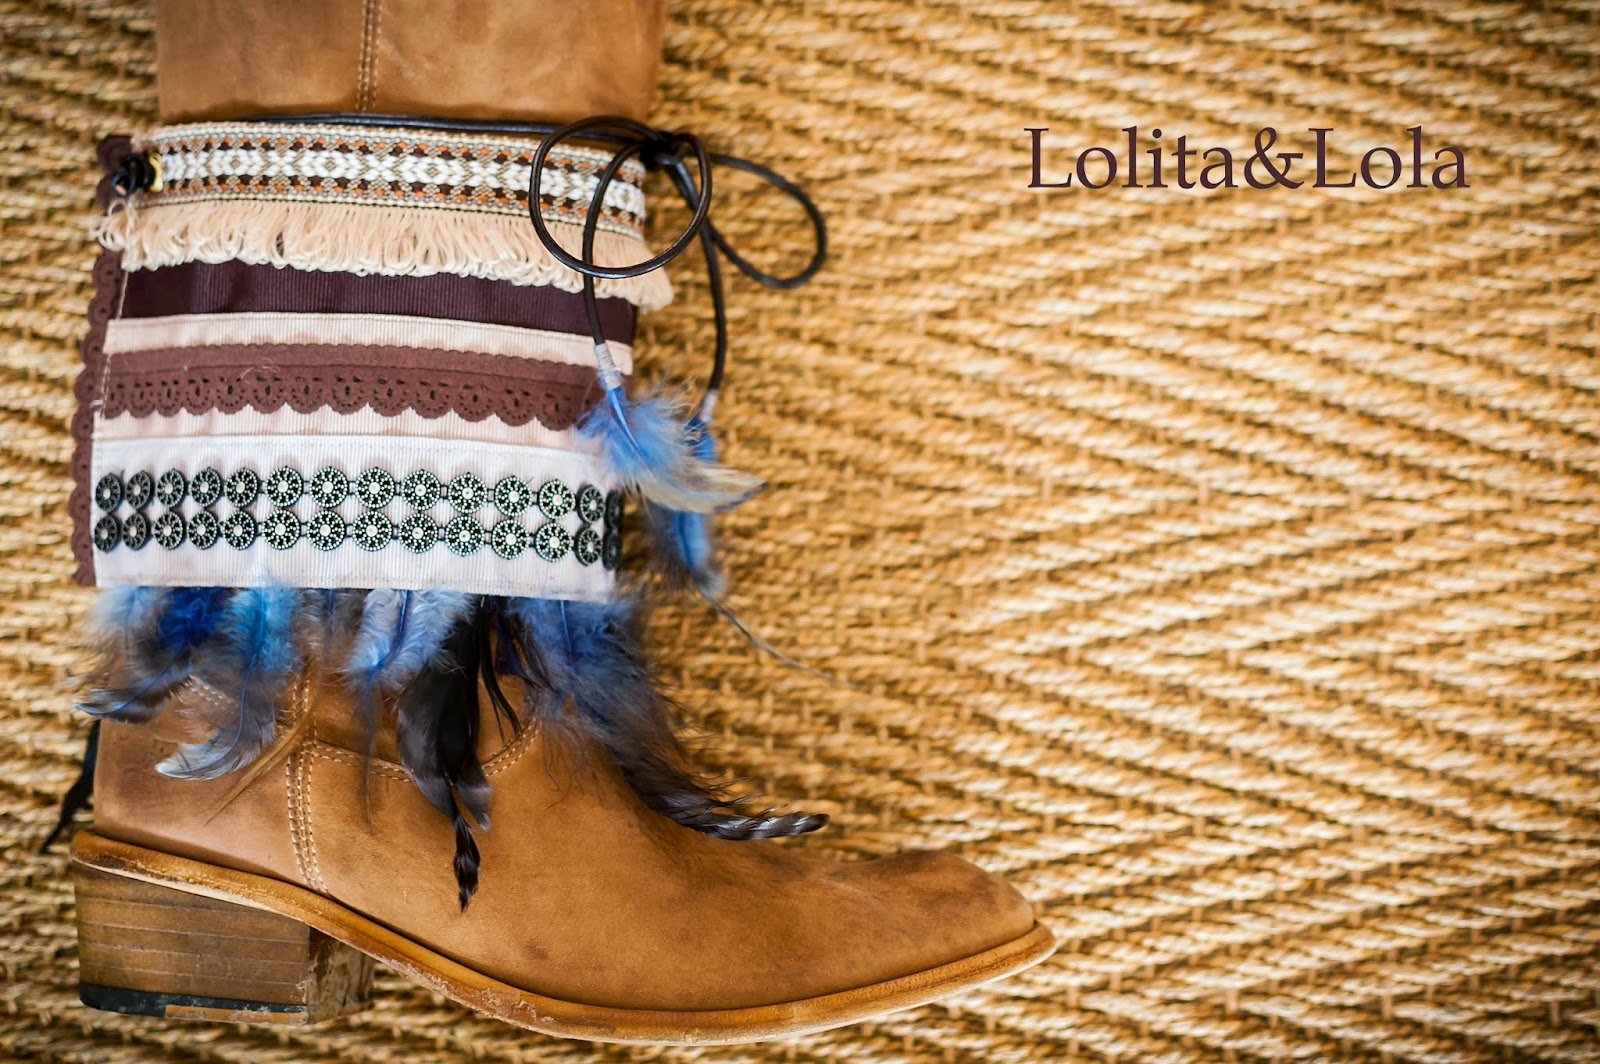 cover boots,cubrebotas